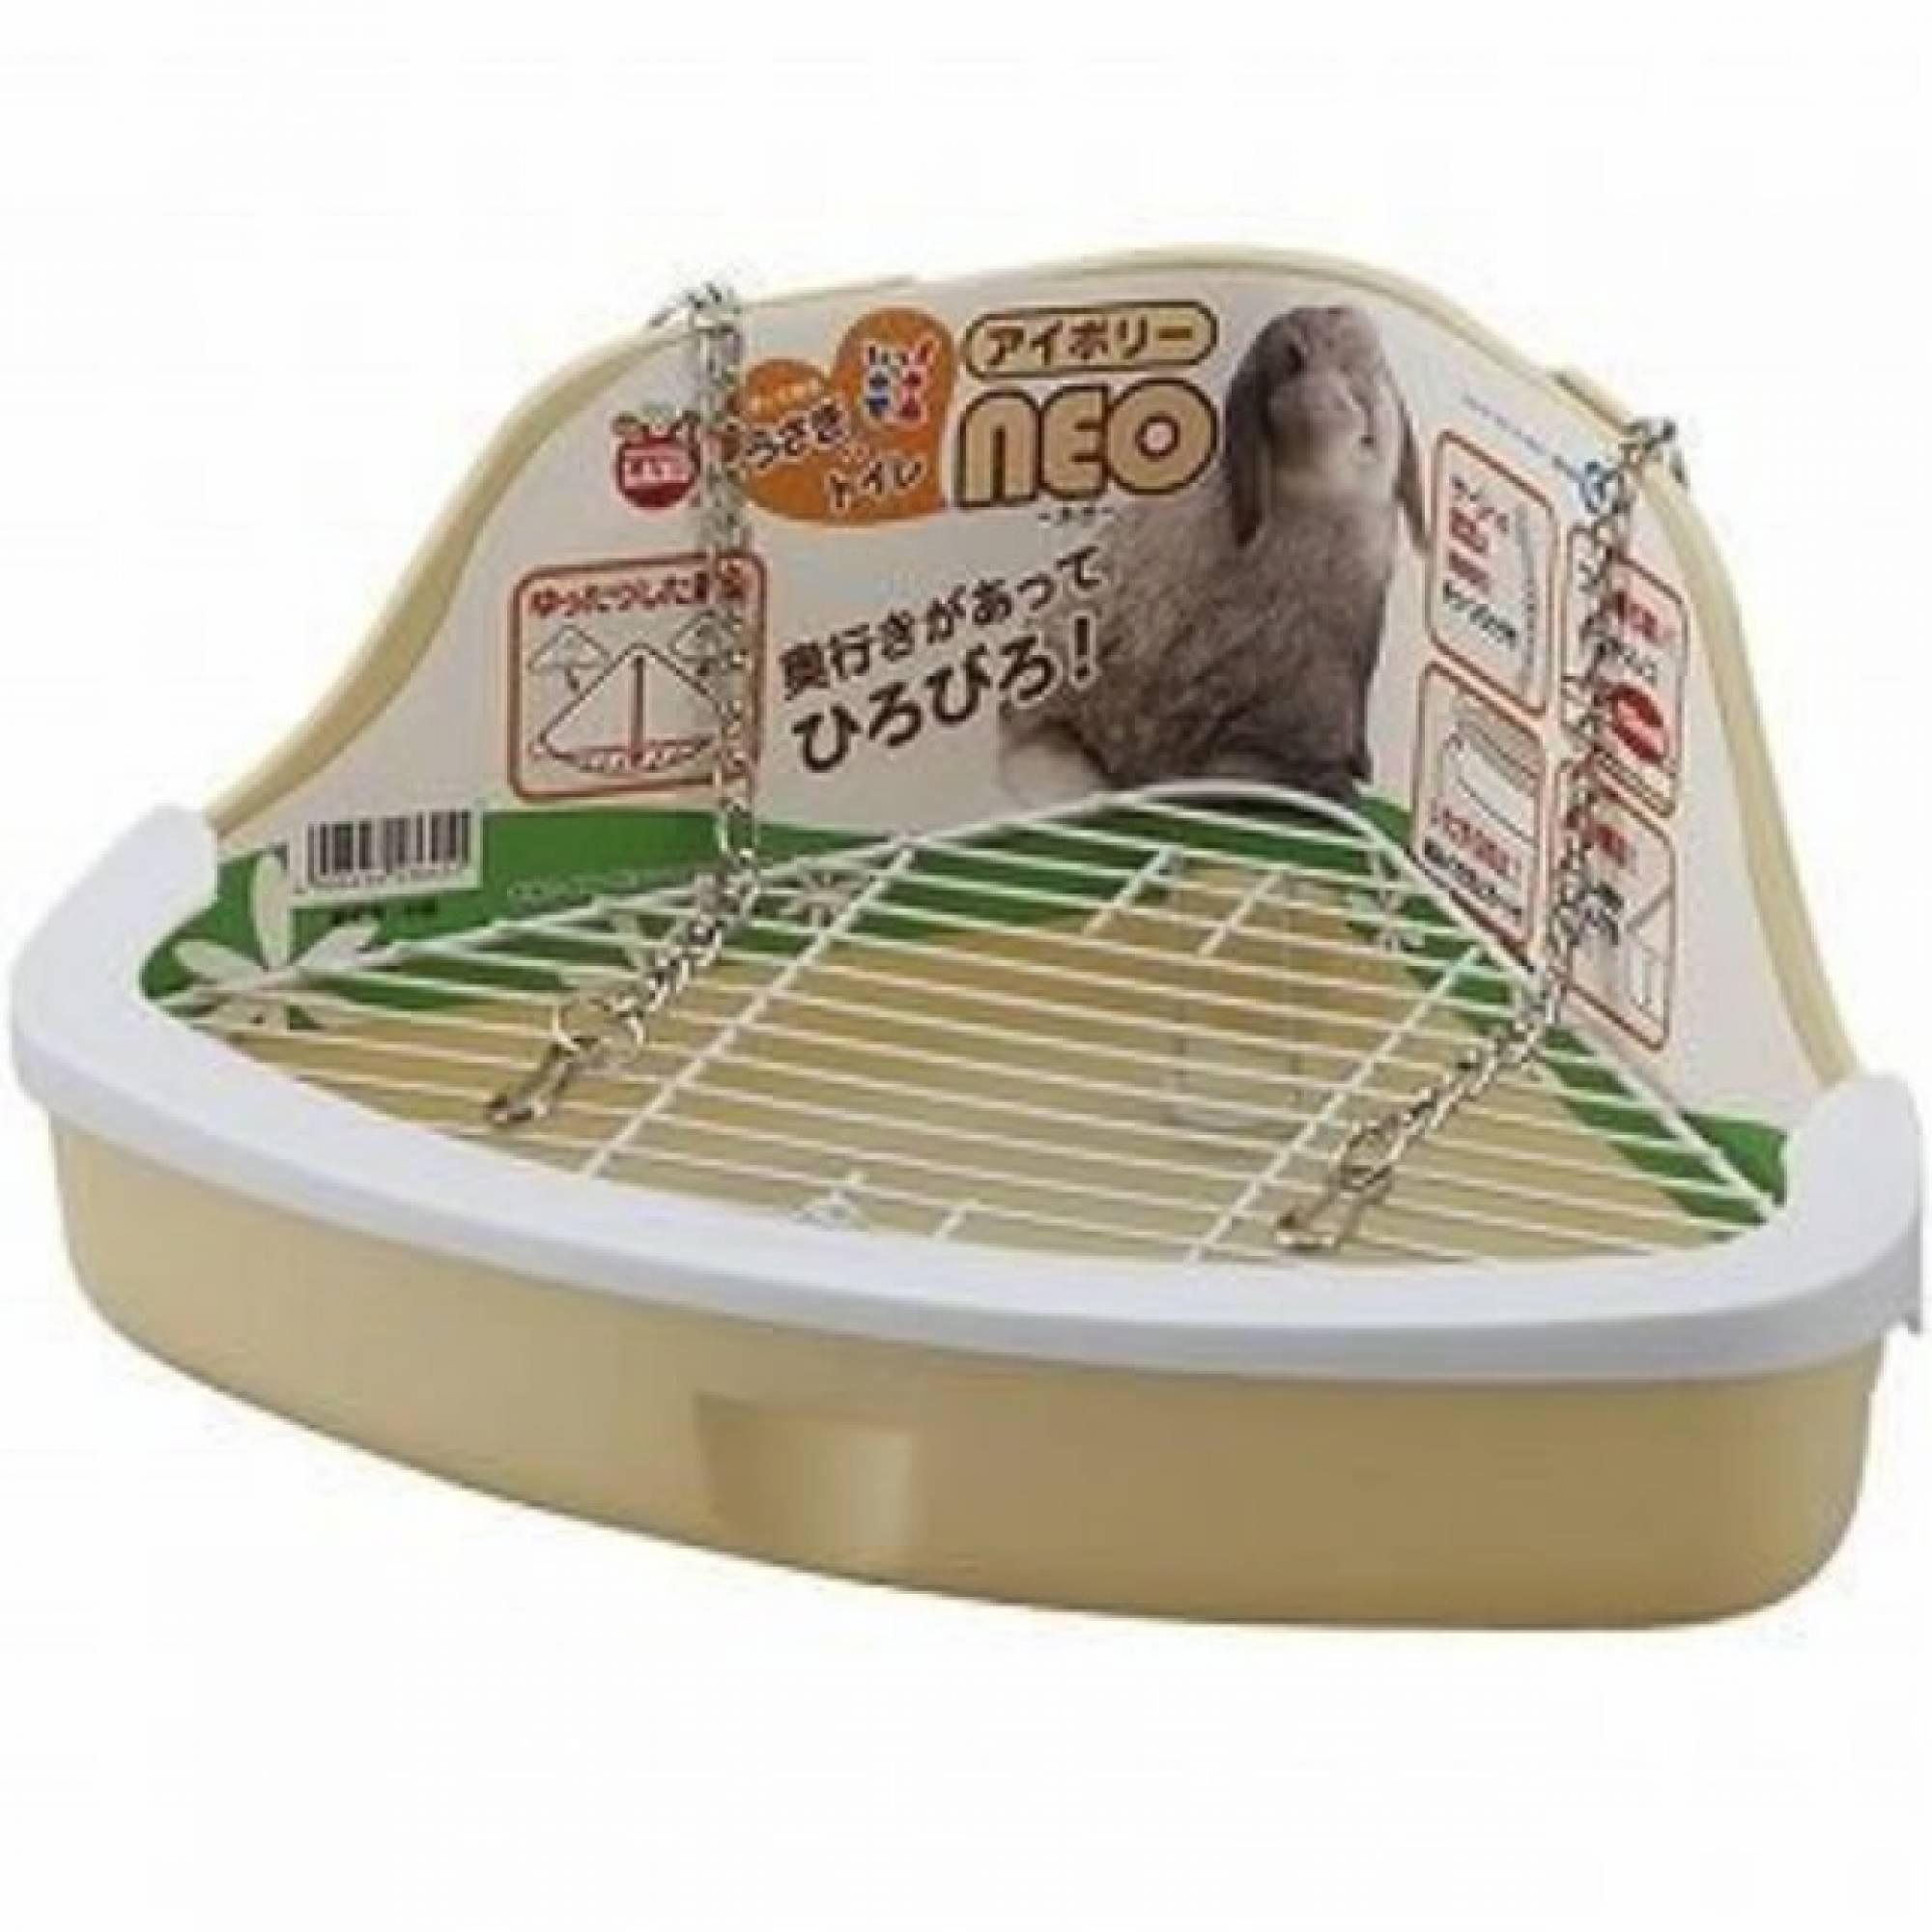 Marukan MR985 - Litter Pan for Rabbit Neo Ivory